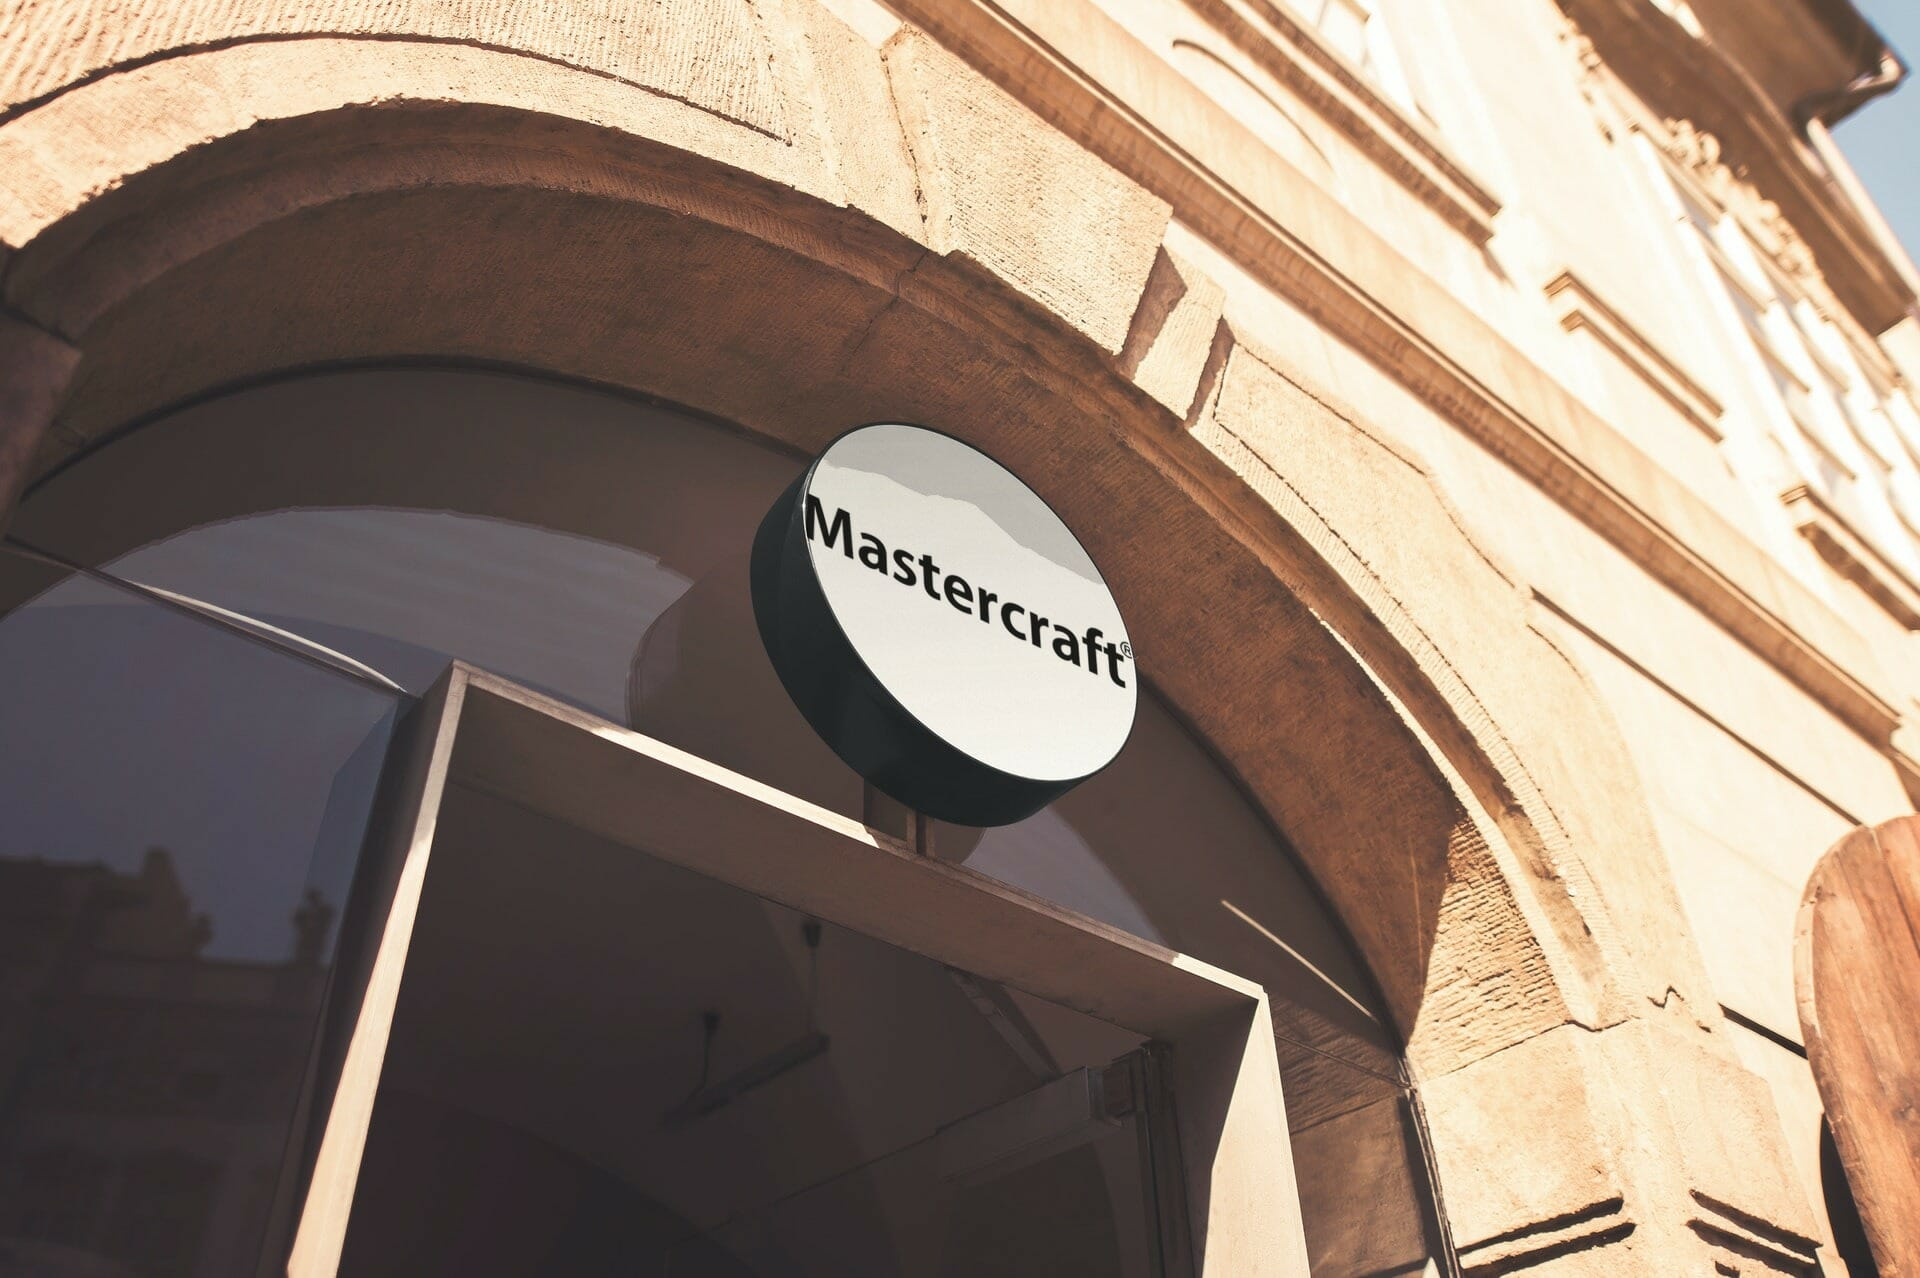 Mastercraft Head Office